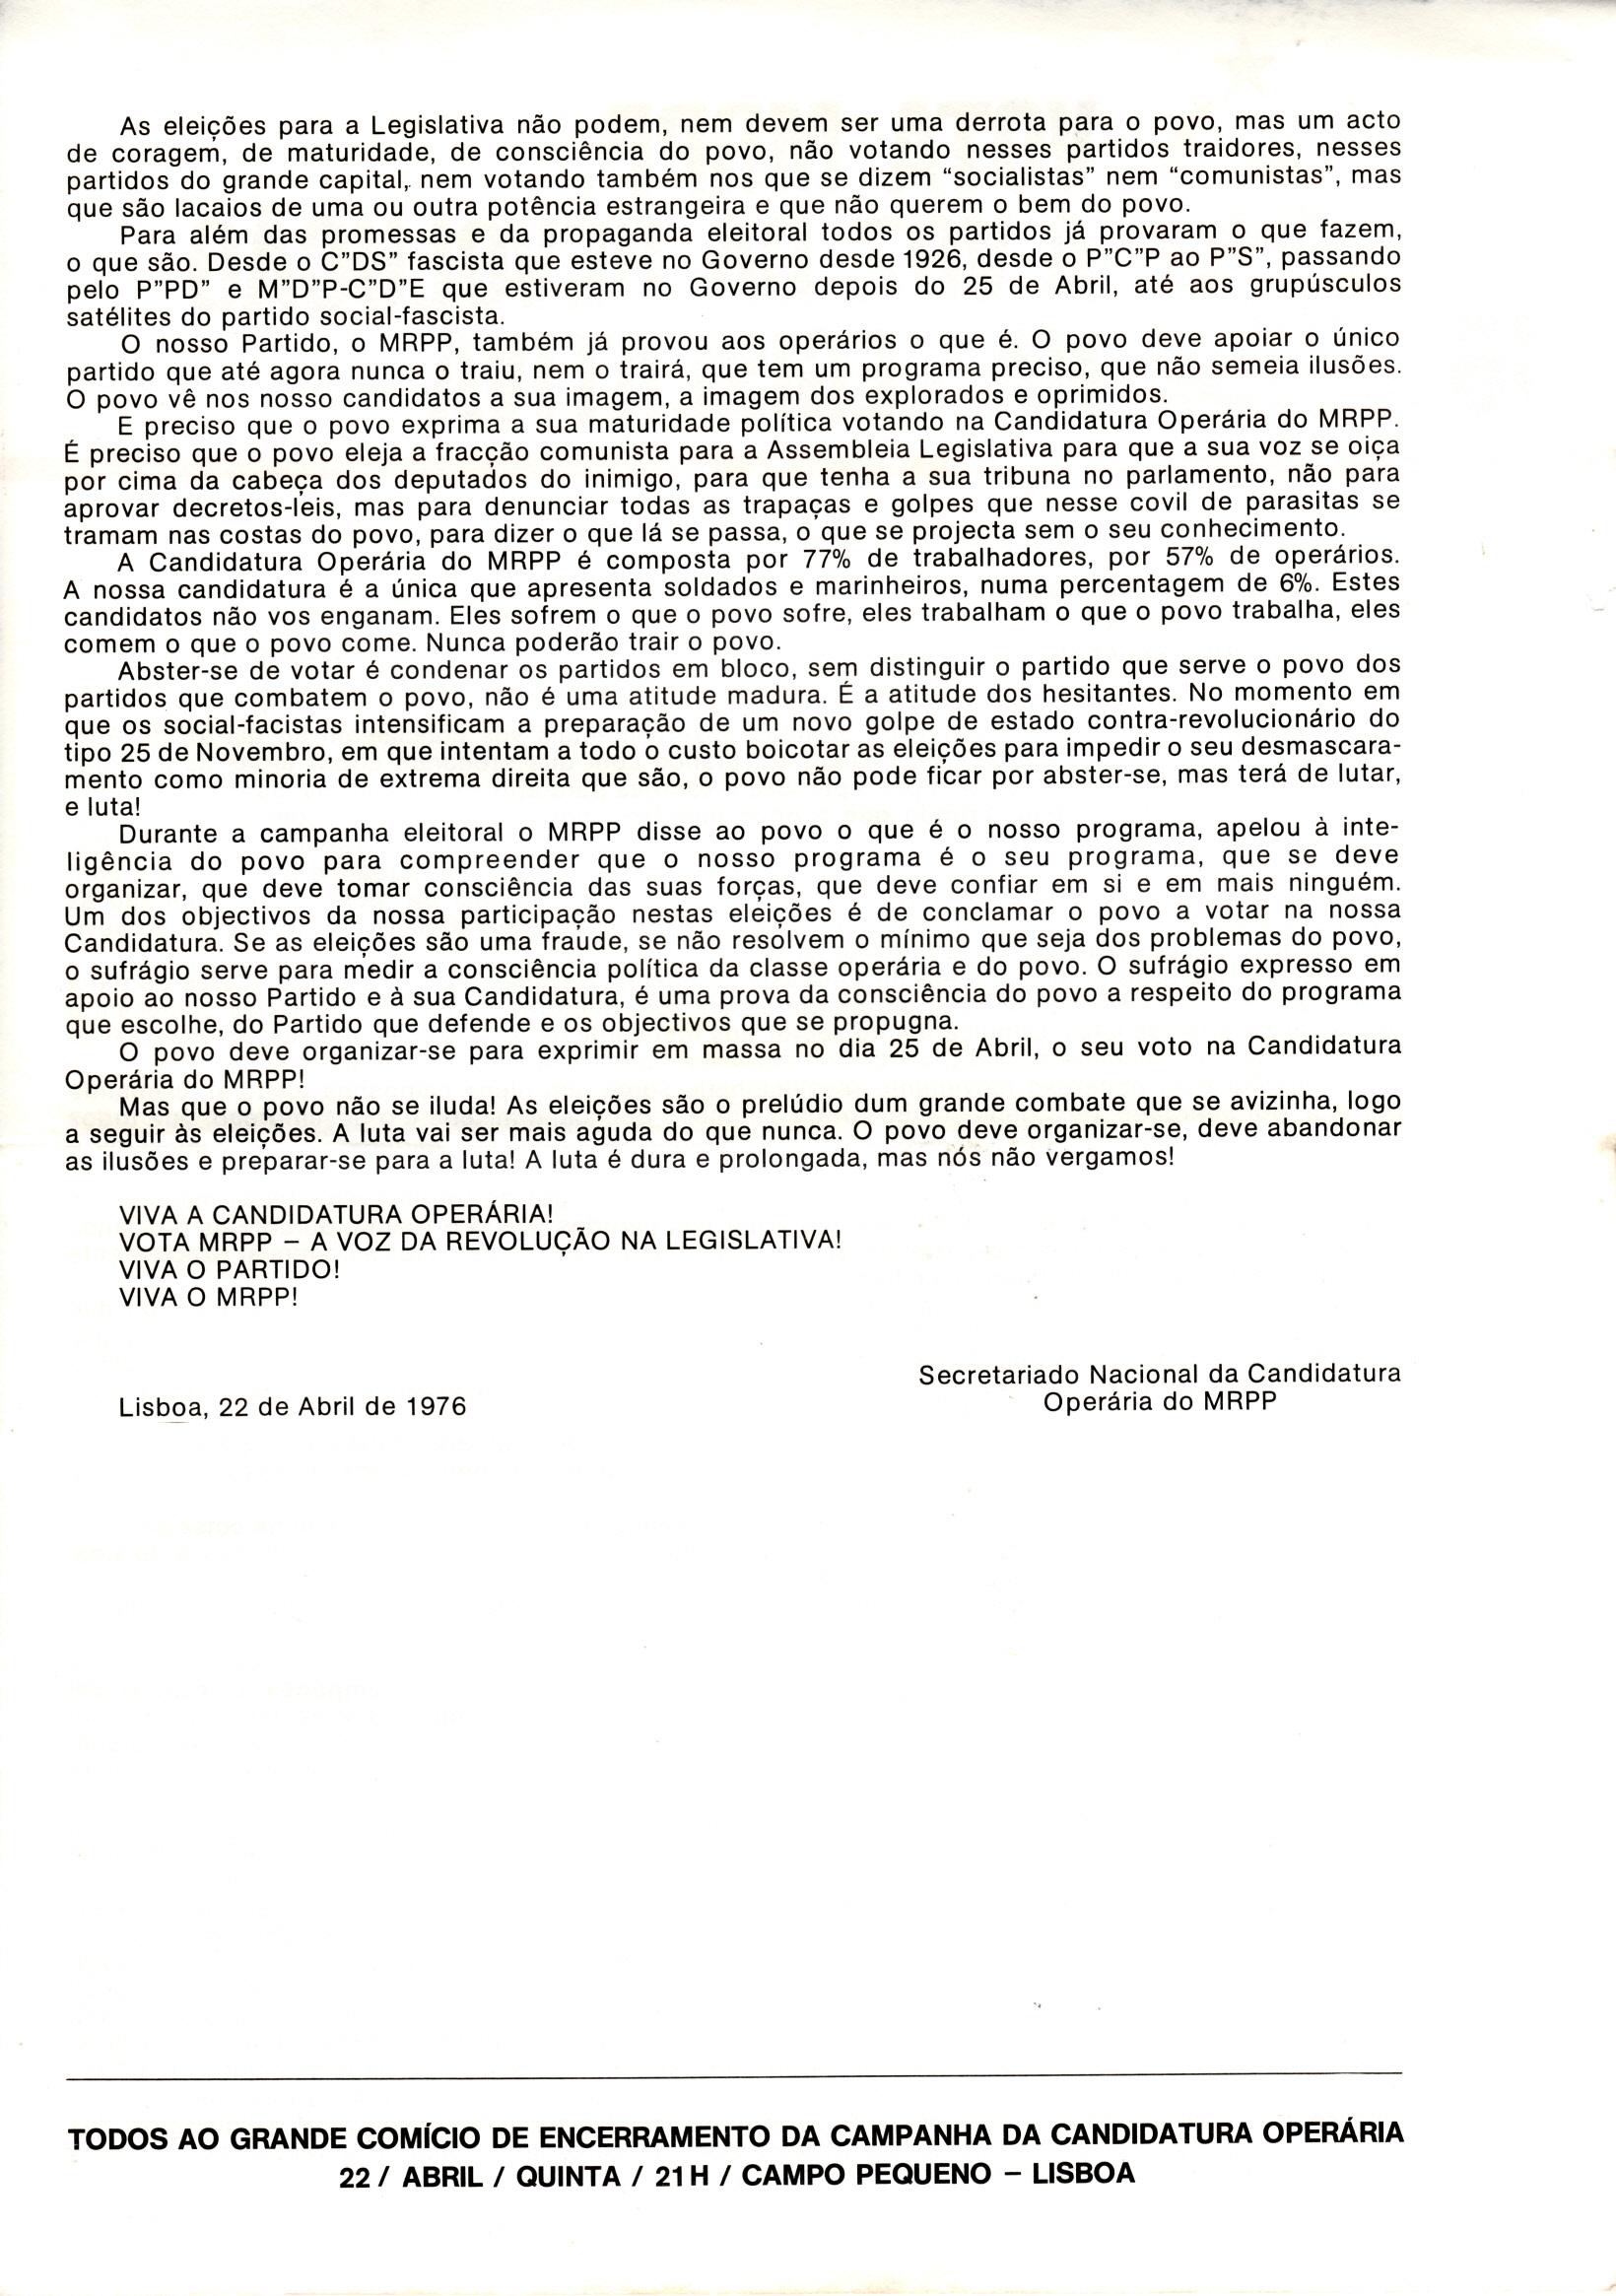 mrpp_1976_eleicao_programa_0032